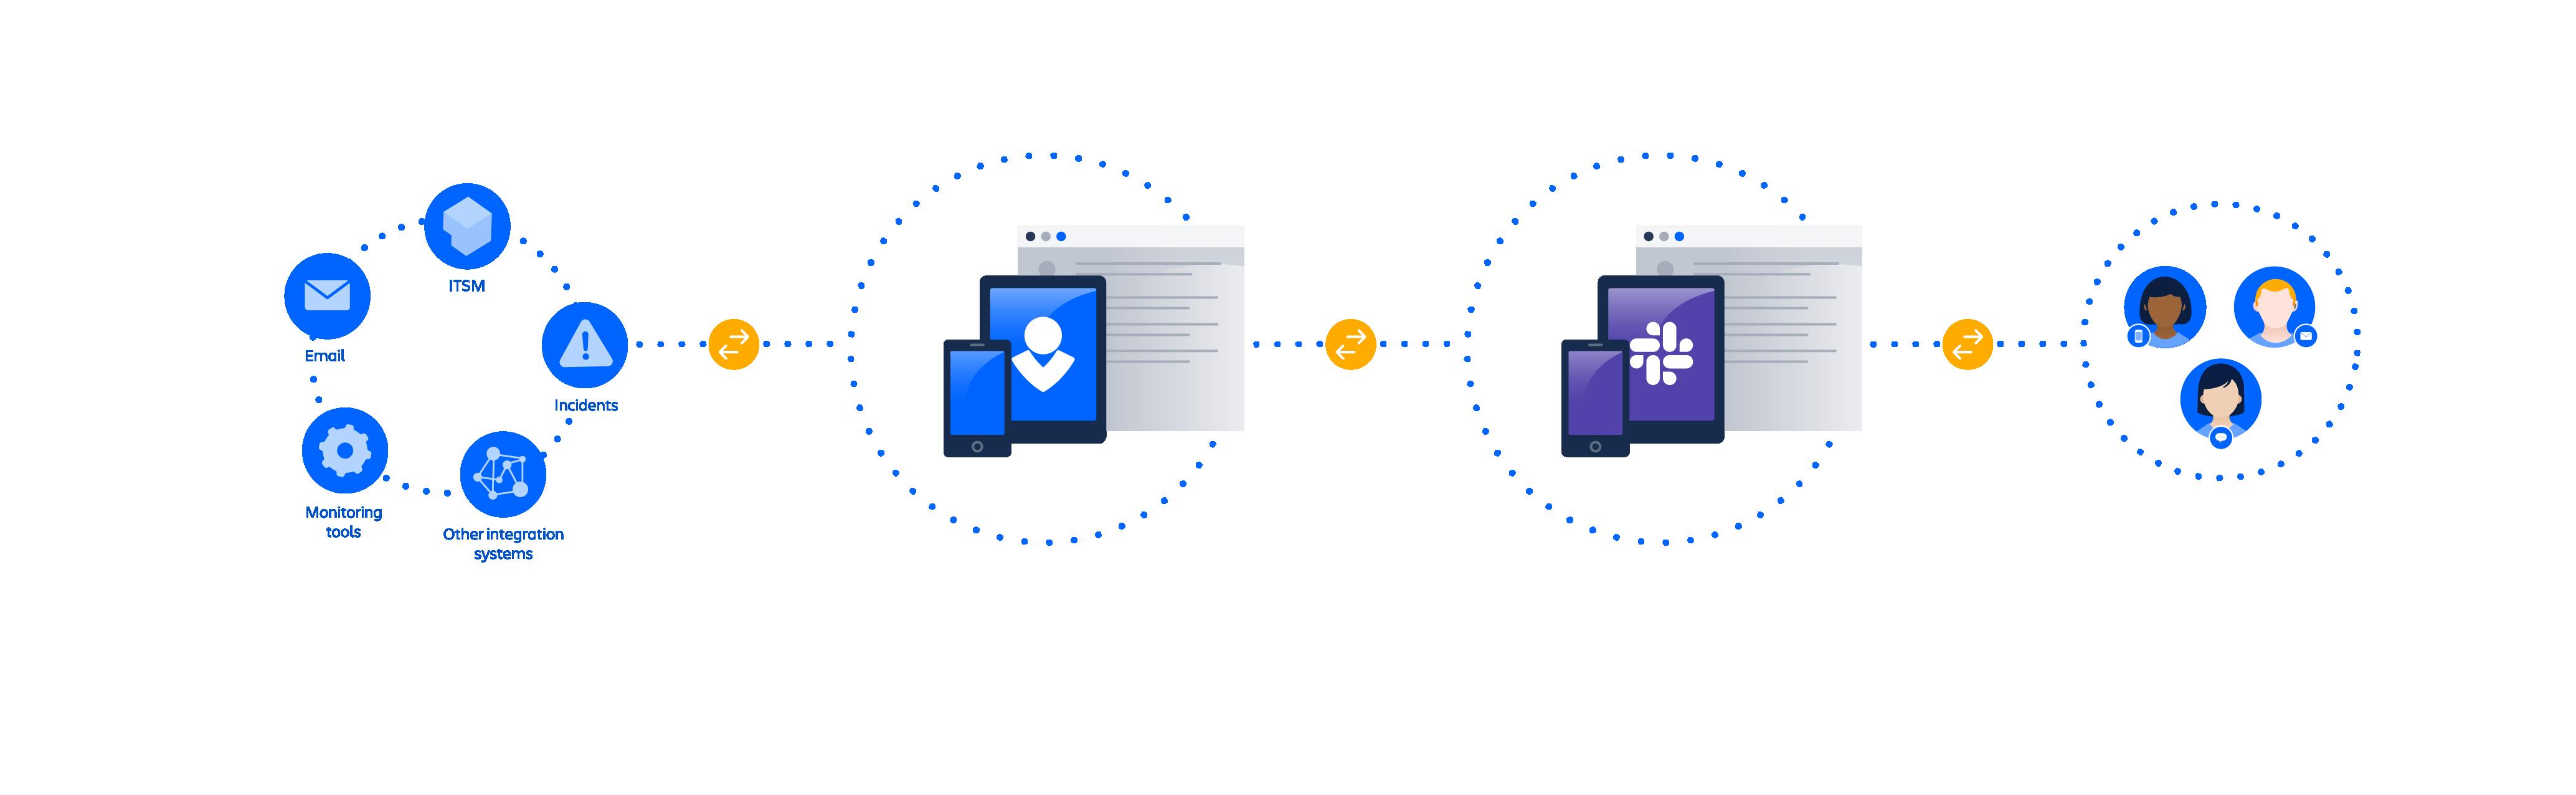 Diagramm: Slack-Integration